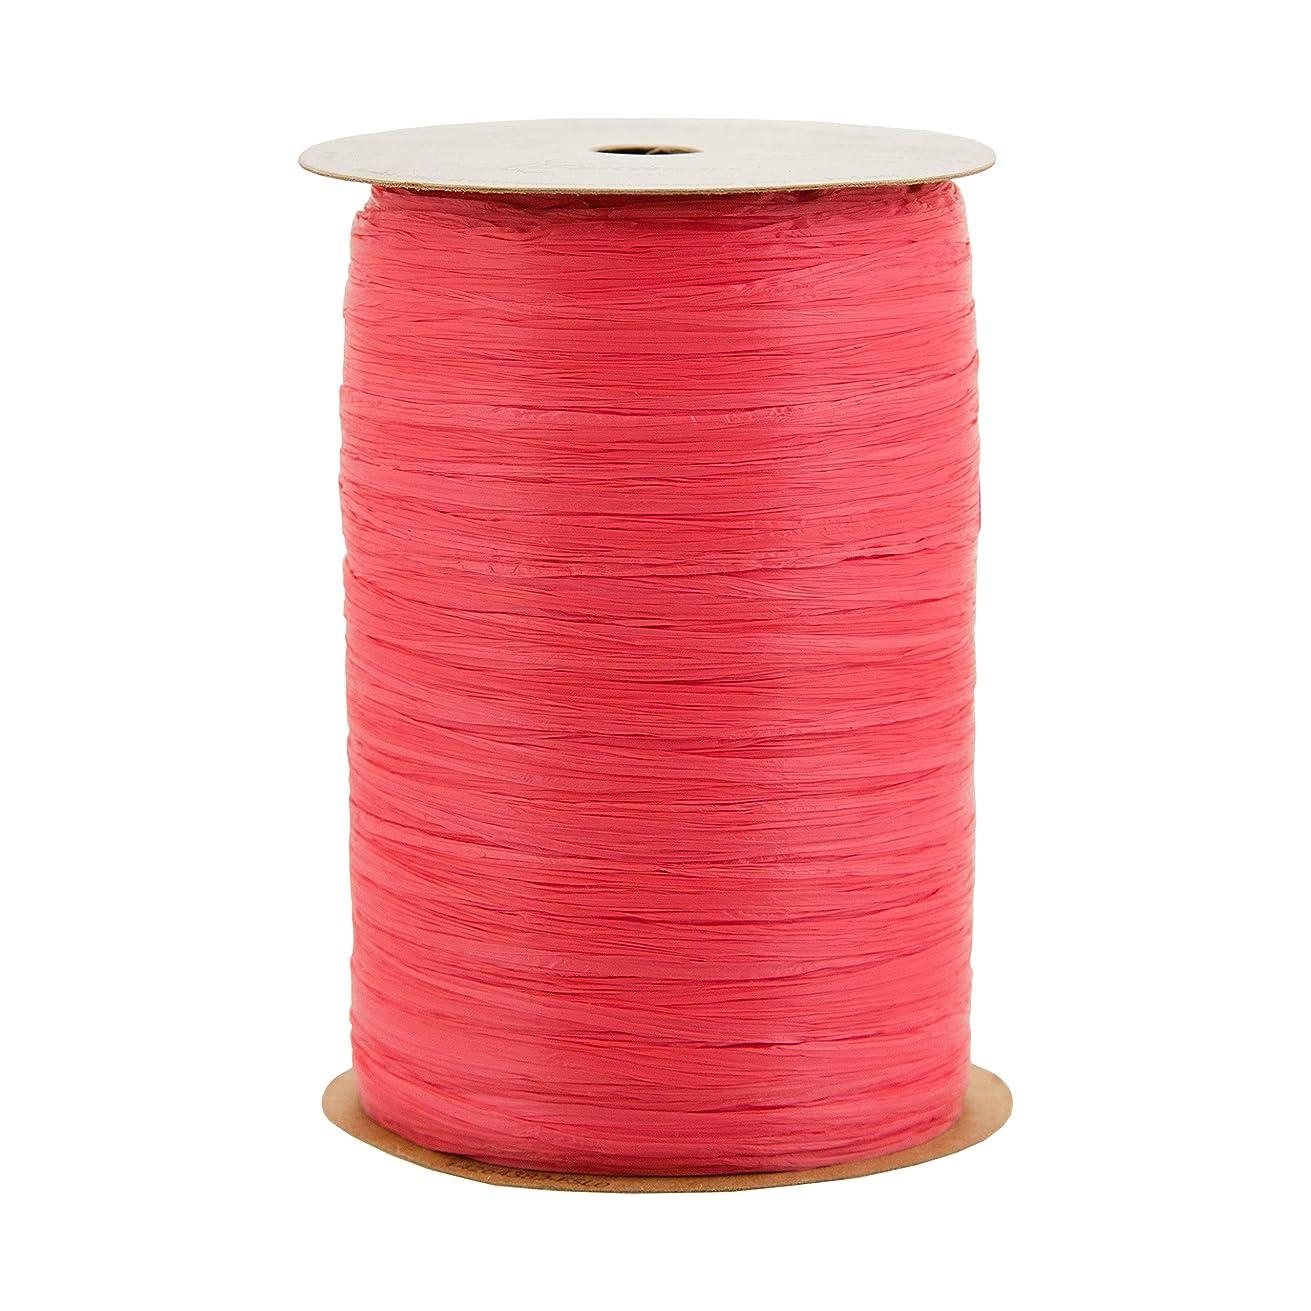 Berwick 74900172 Offray 1/4'' Wide Matte Raffia Ribbon, Neon Coral Orange, 100 Yards